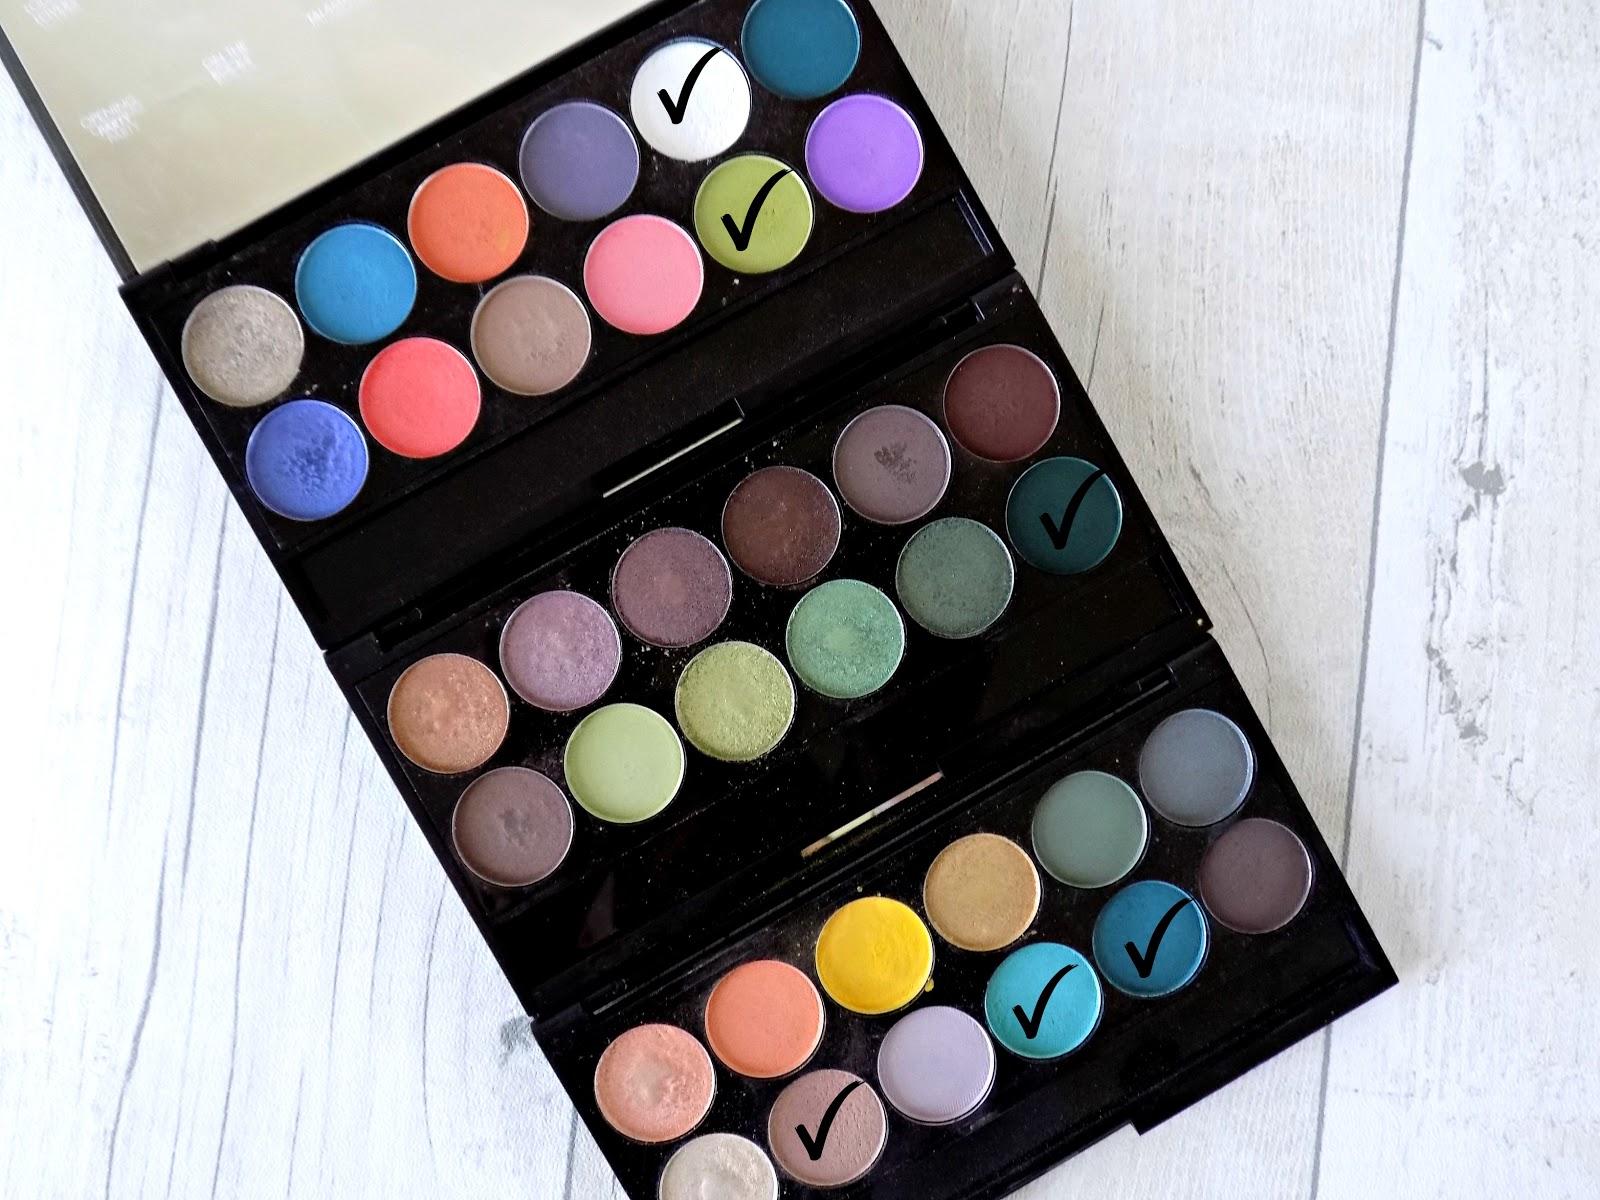 Sleek eyeshadow palettes